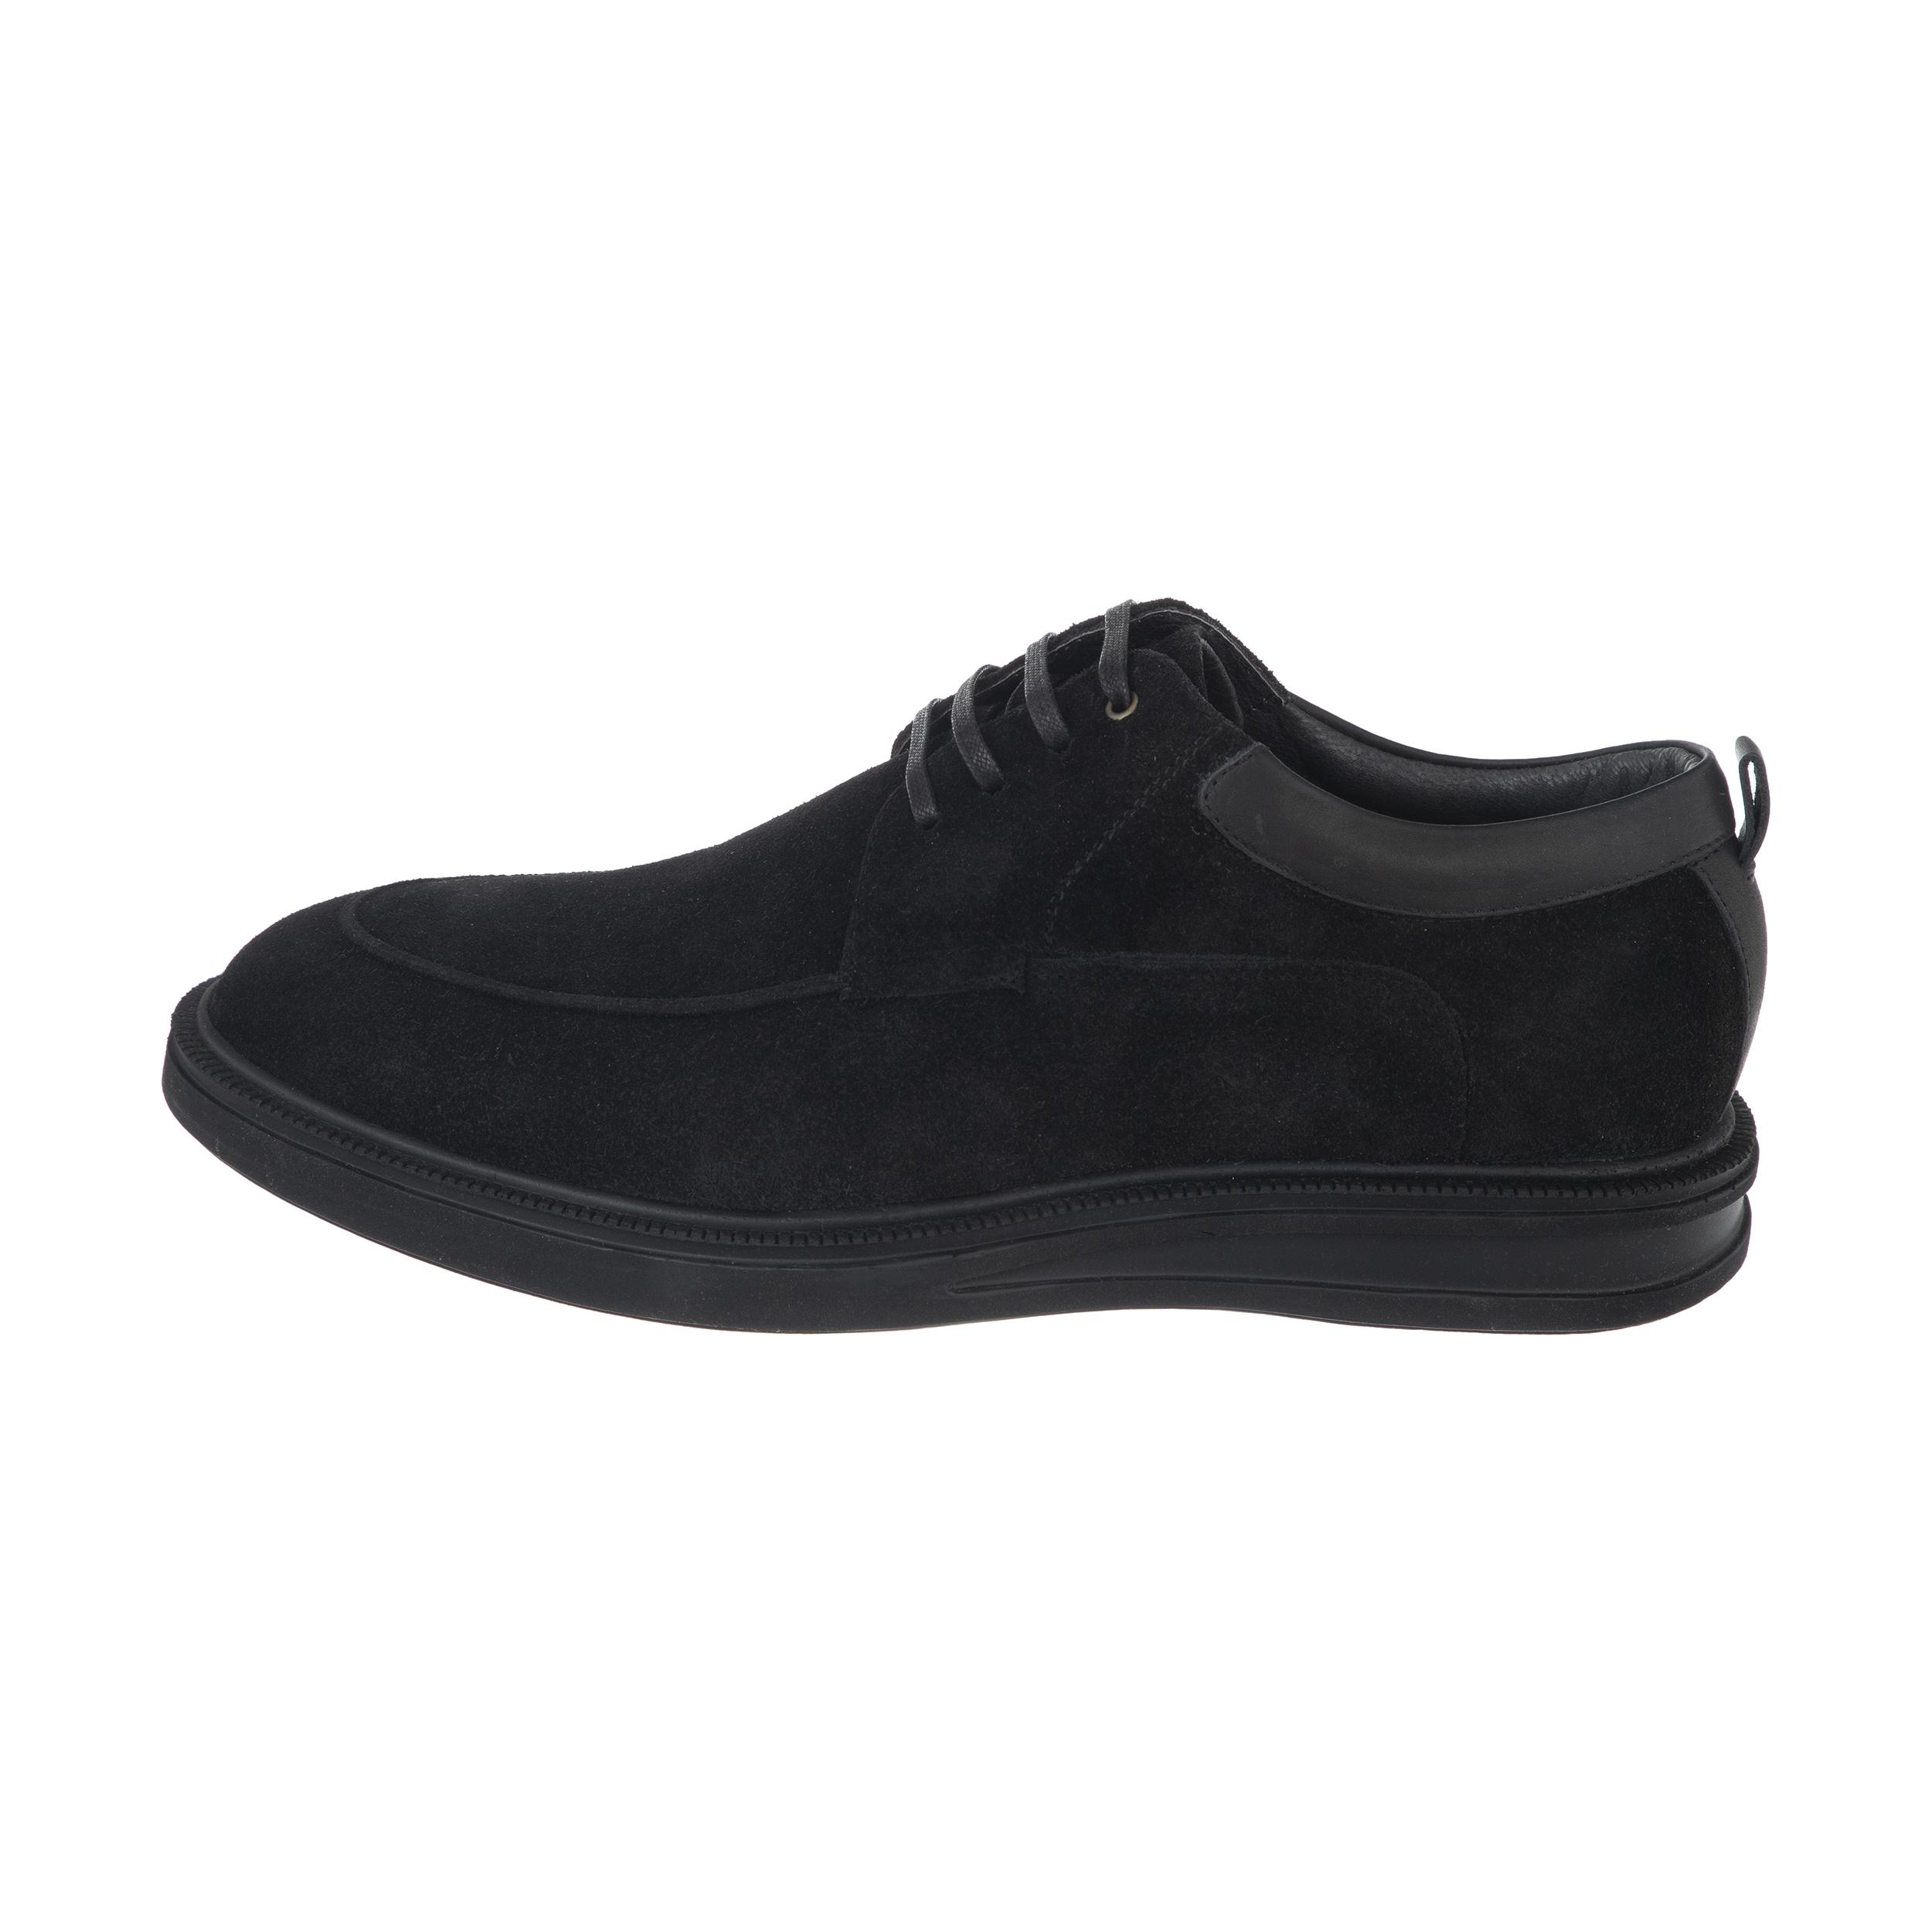 کفش روزمره مردانه آرتمن مدل Anders-41820